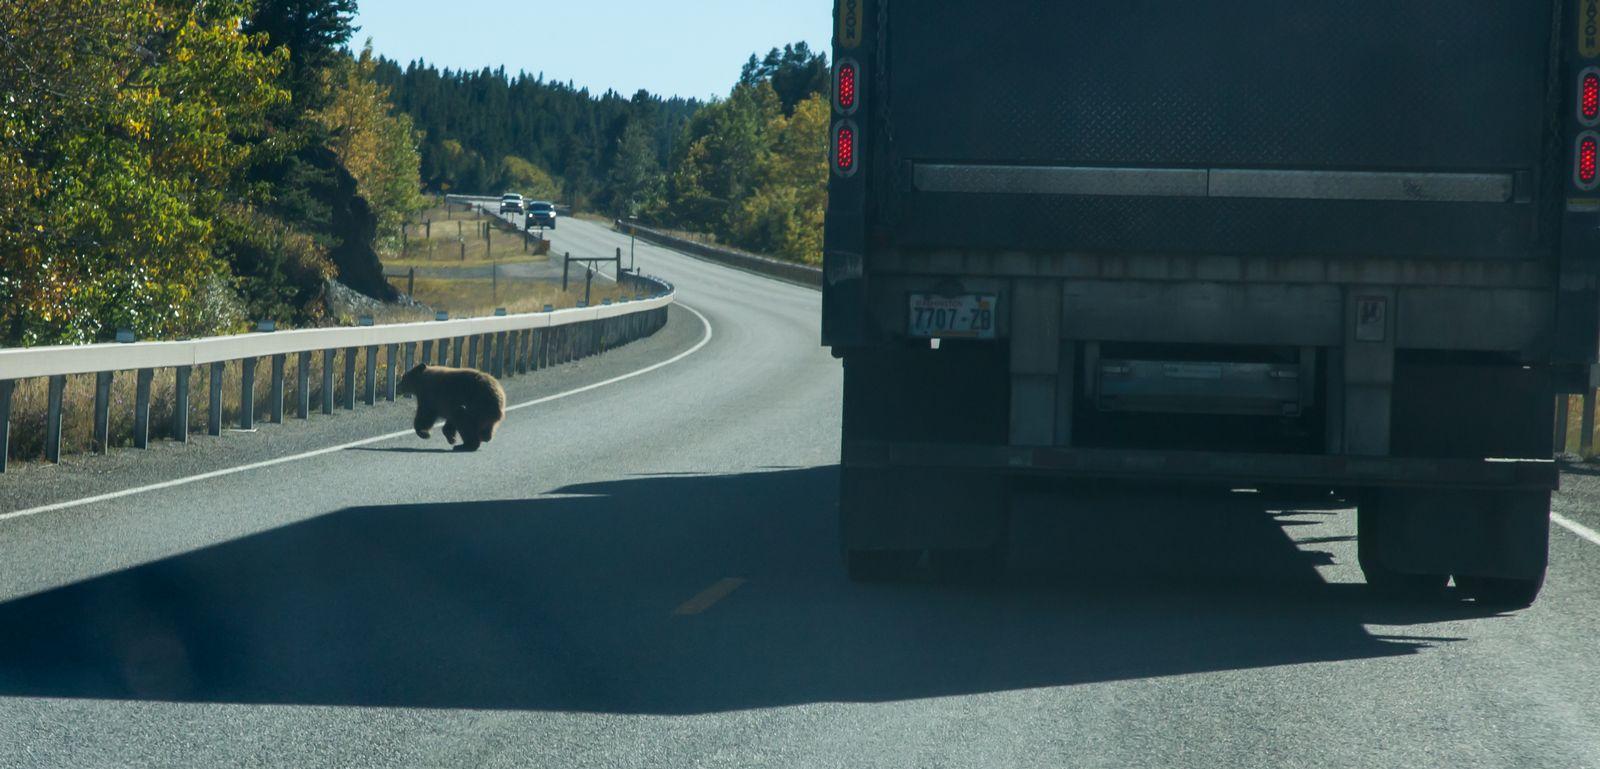 ¿Por qué el oso cruzó la carretera?